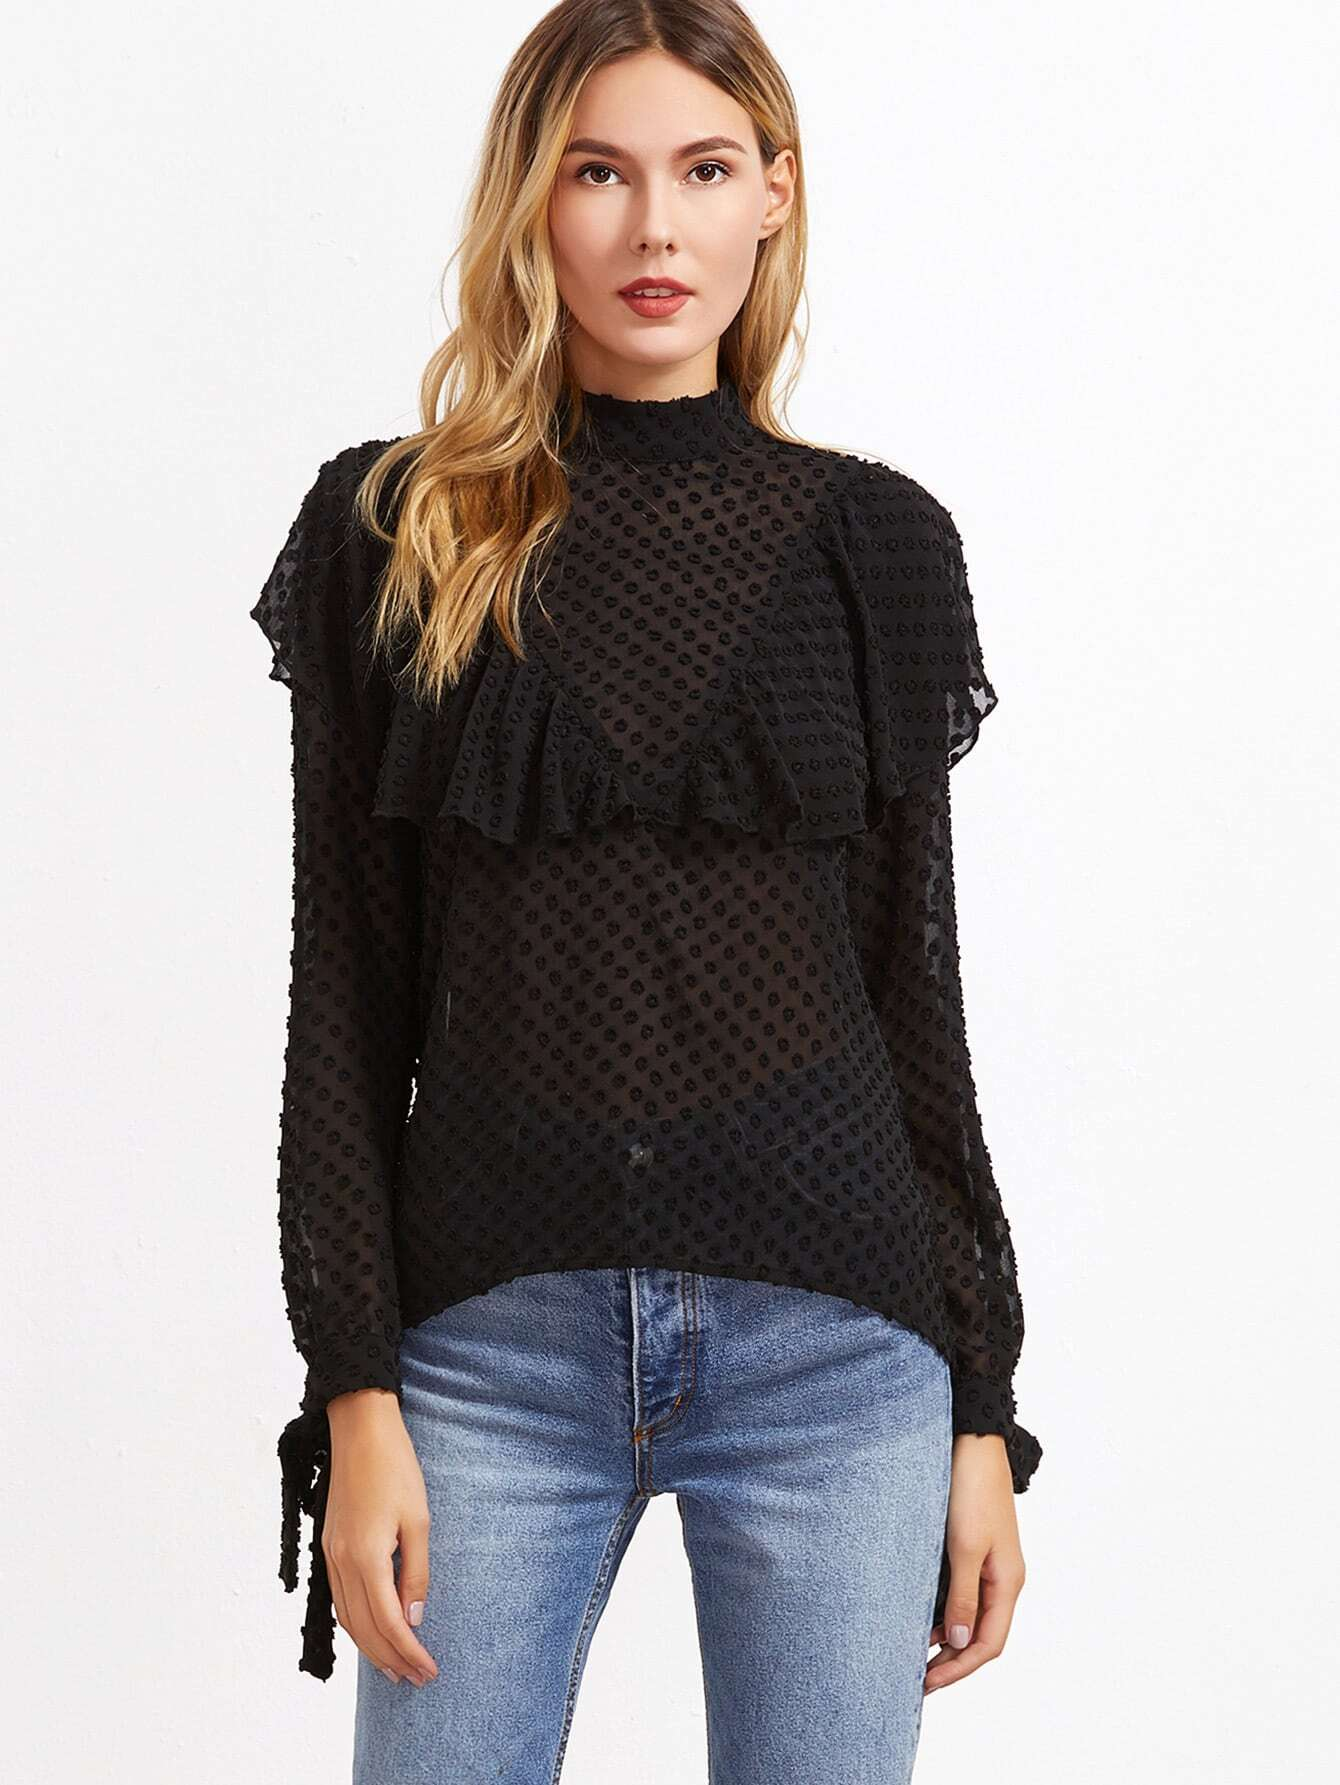 blouse161117701_2